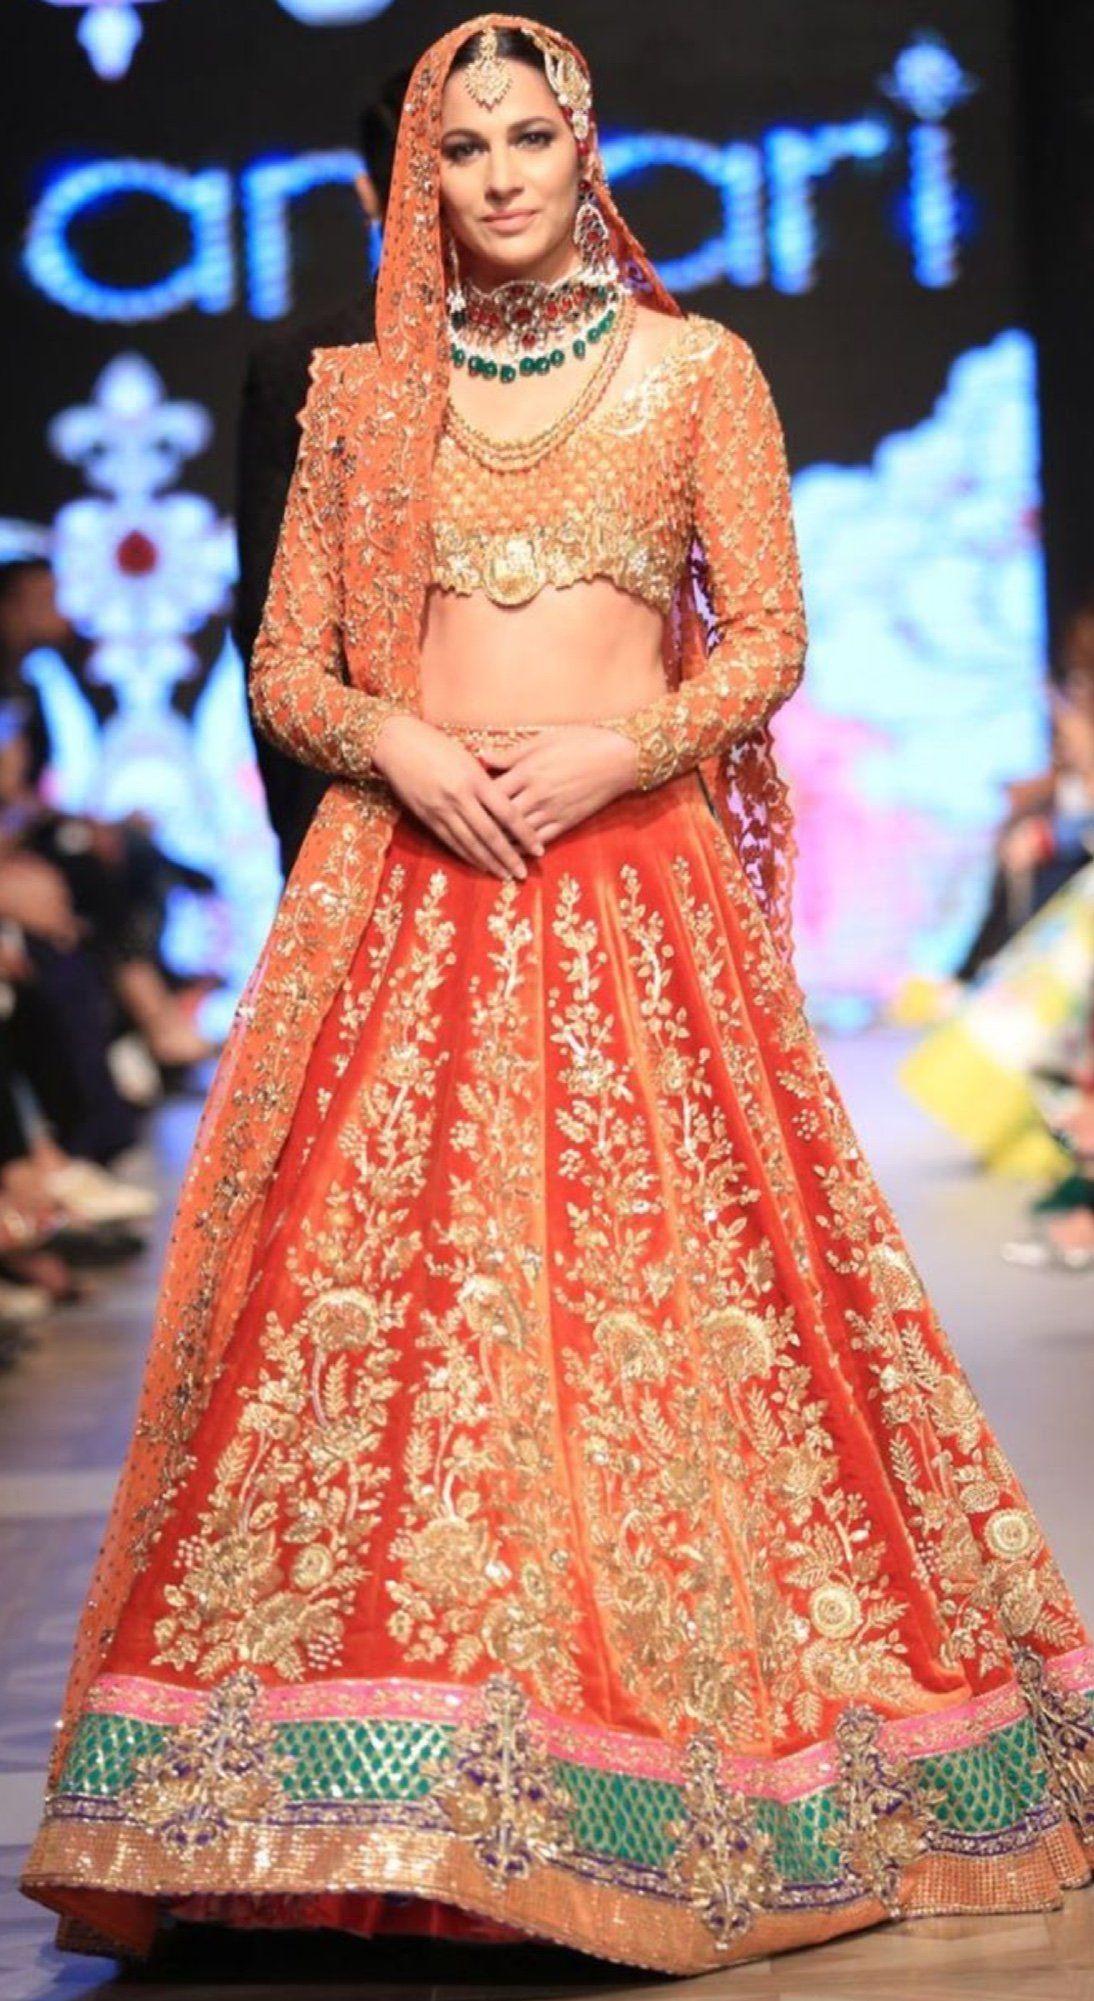 Bridal ghagra choli in beutifull reddish orange color